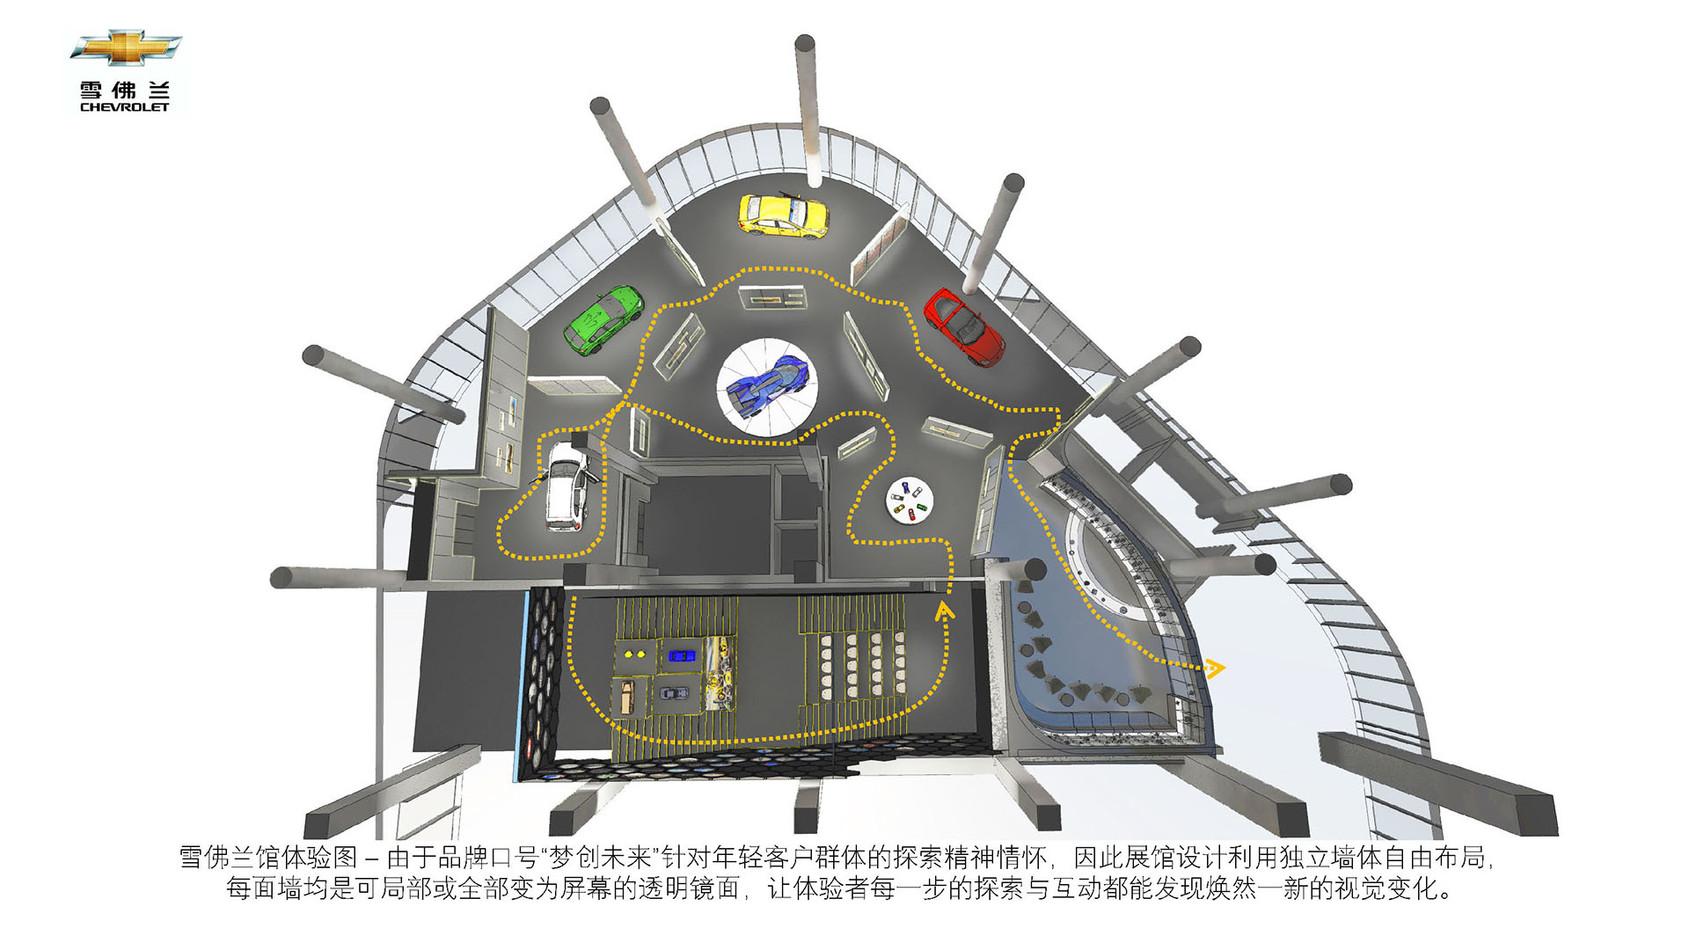 SGM-CORPORATE-MUSEUM-ZH 42.jpg